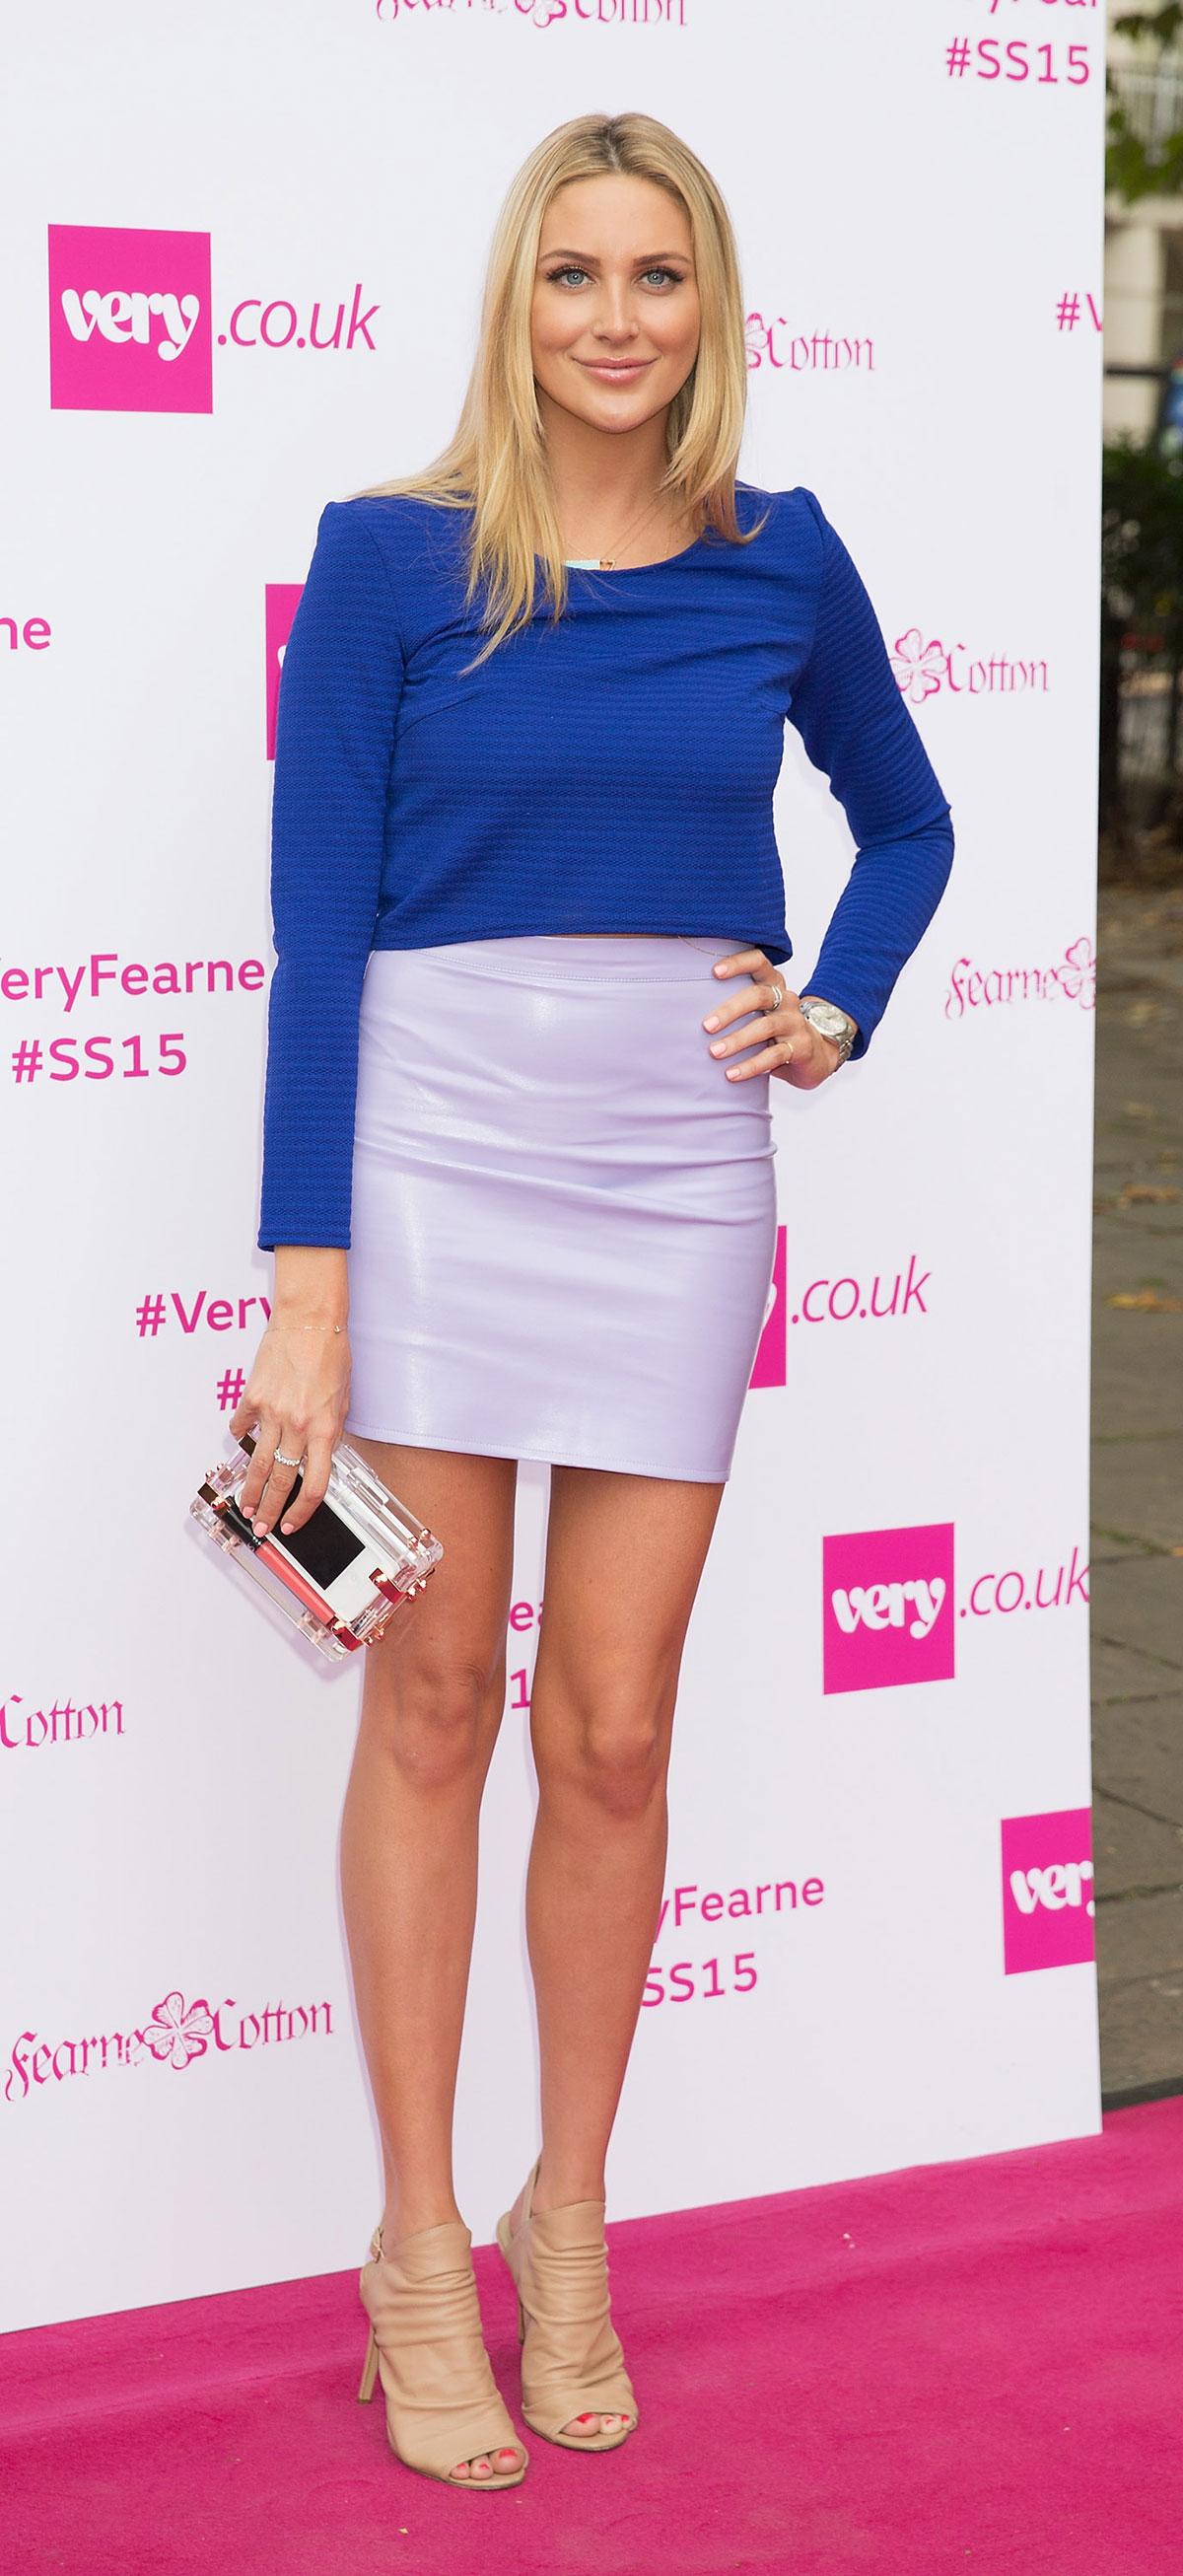 Stephanie Pratt attends Fearne Cotton's Very.co.uk Fashion Show